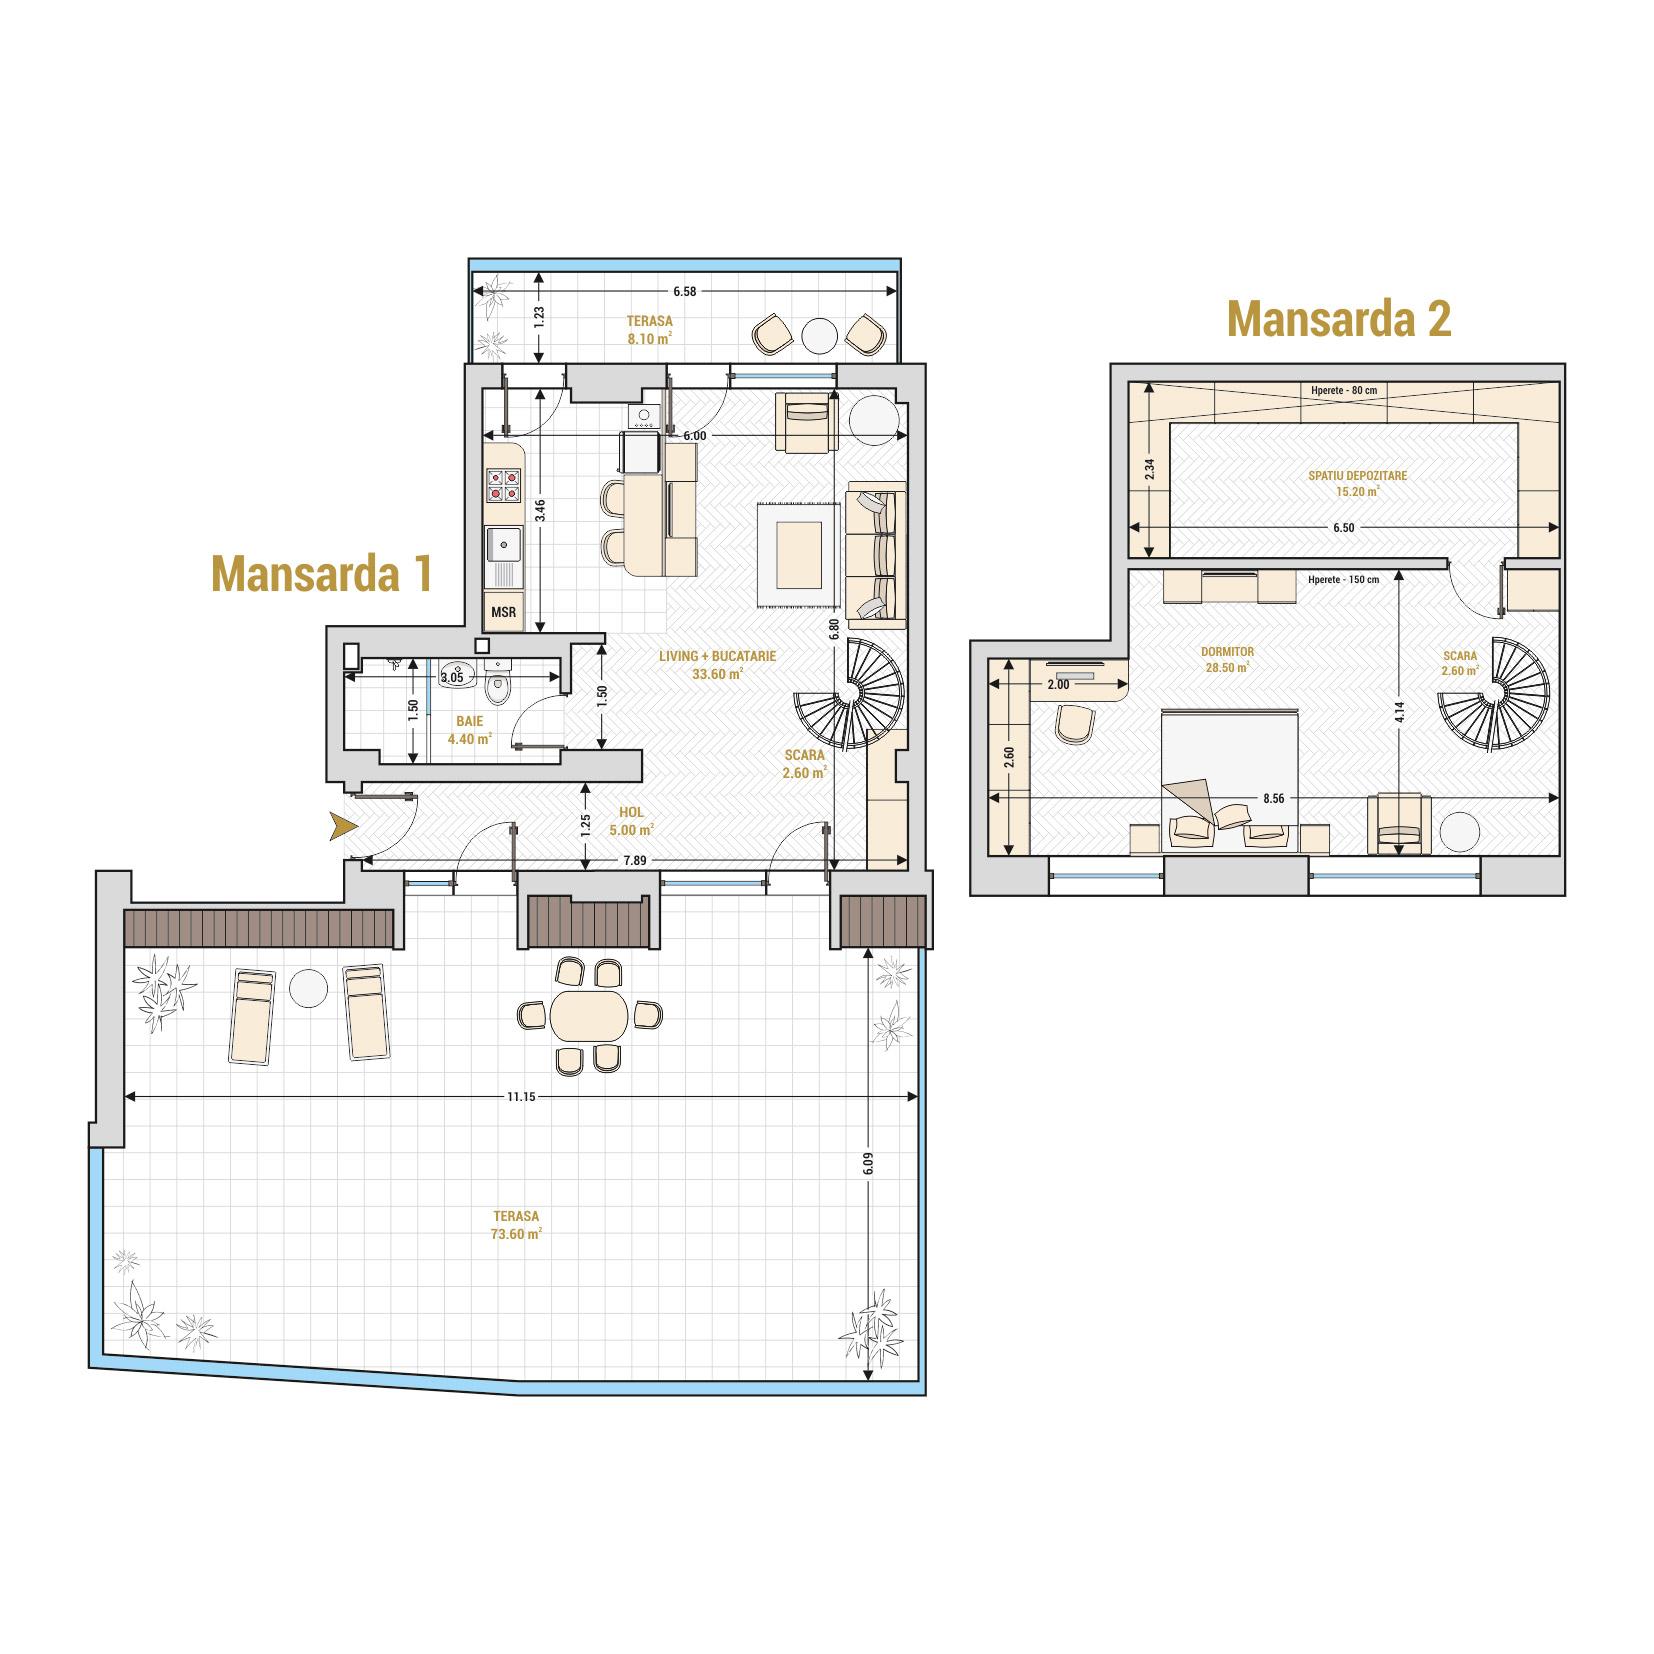 Duplex cu 2 camere Bucuresti - Catedral Residence - Marriott, Piata Unirii, 13 Septembrie, Izvor - Suprafata utila totala - 173.60 m² metri patrati